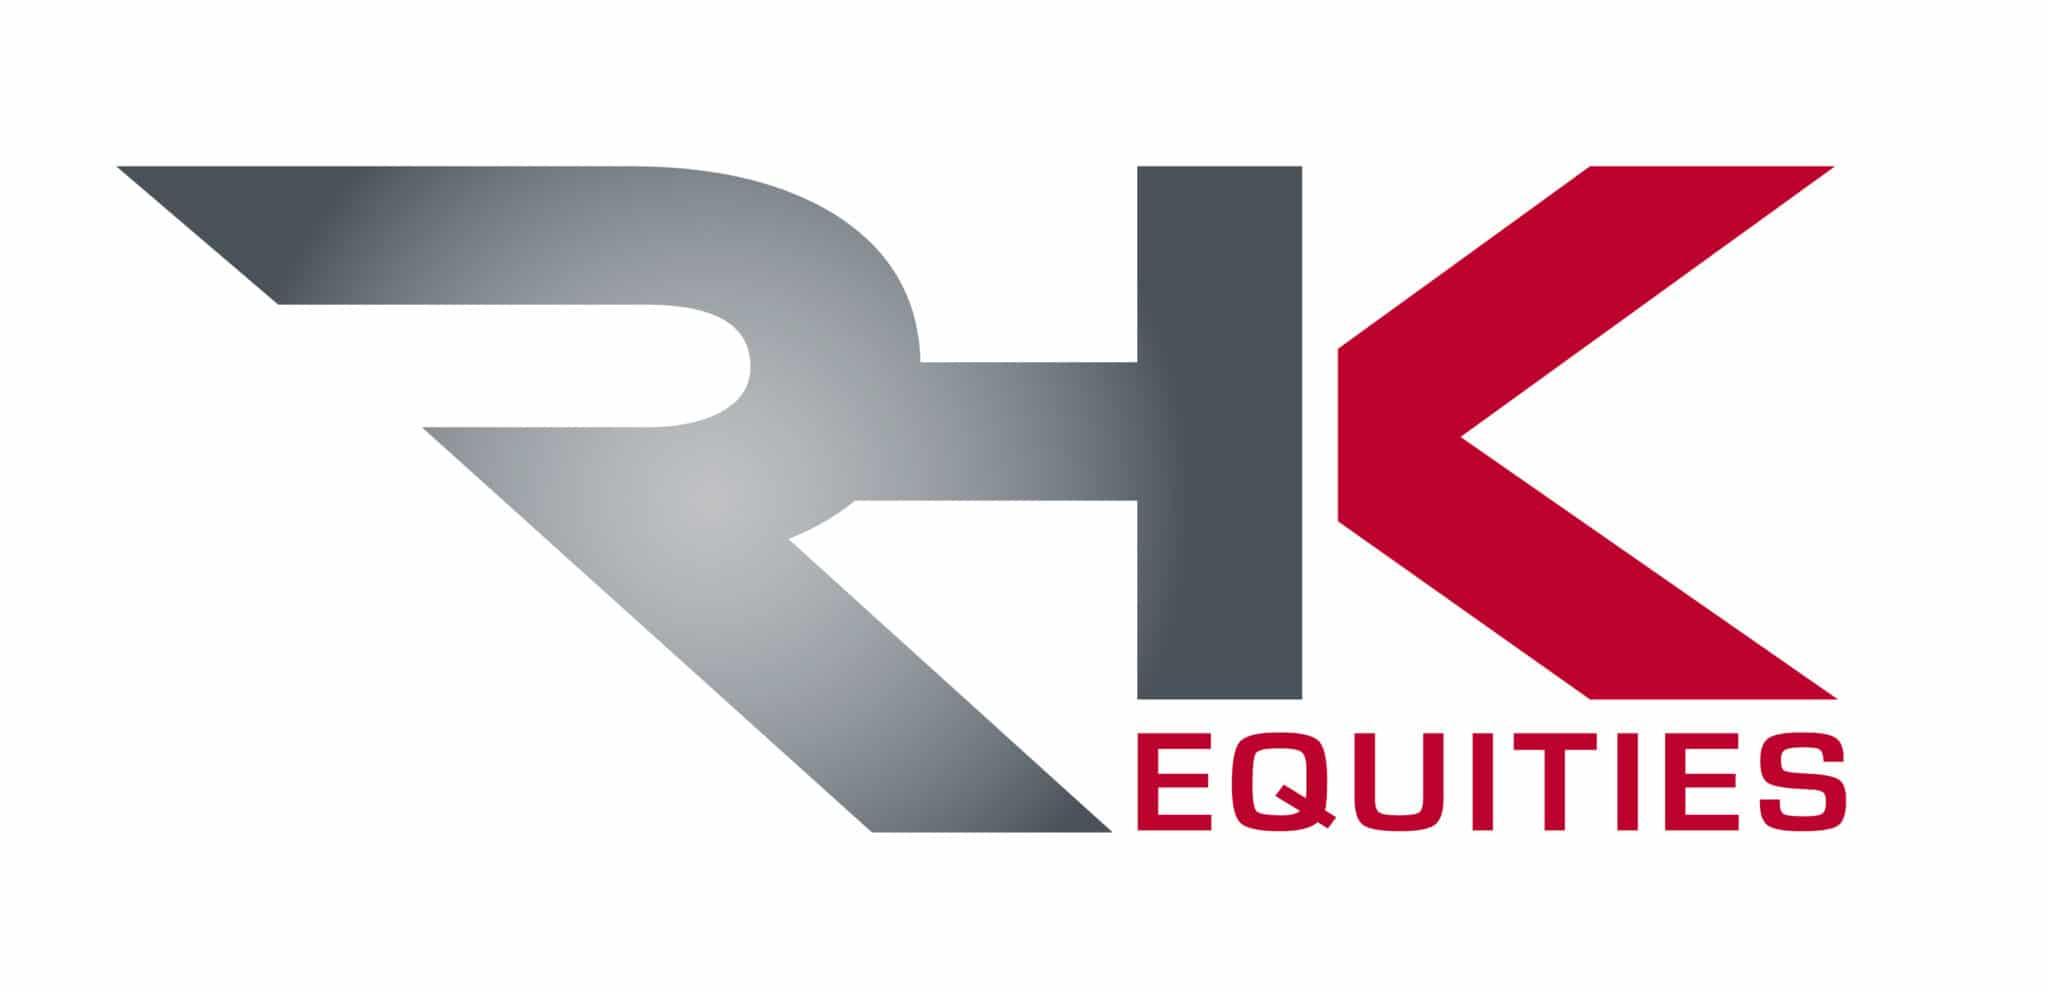 RHK Equities